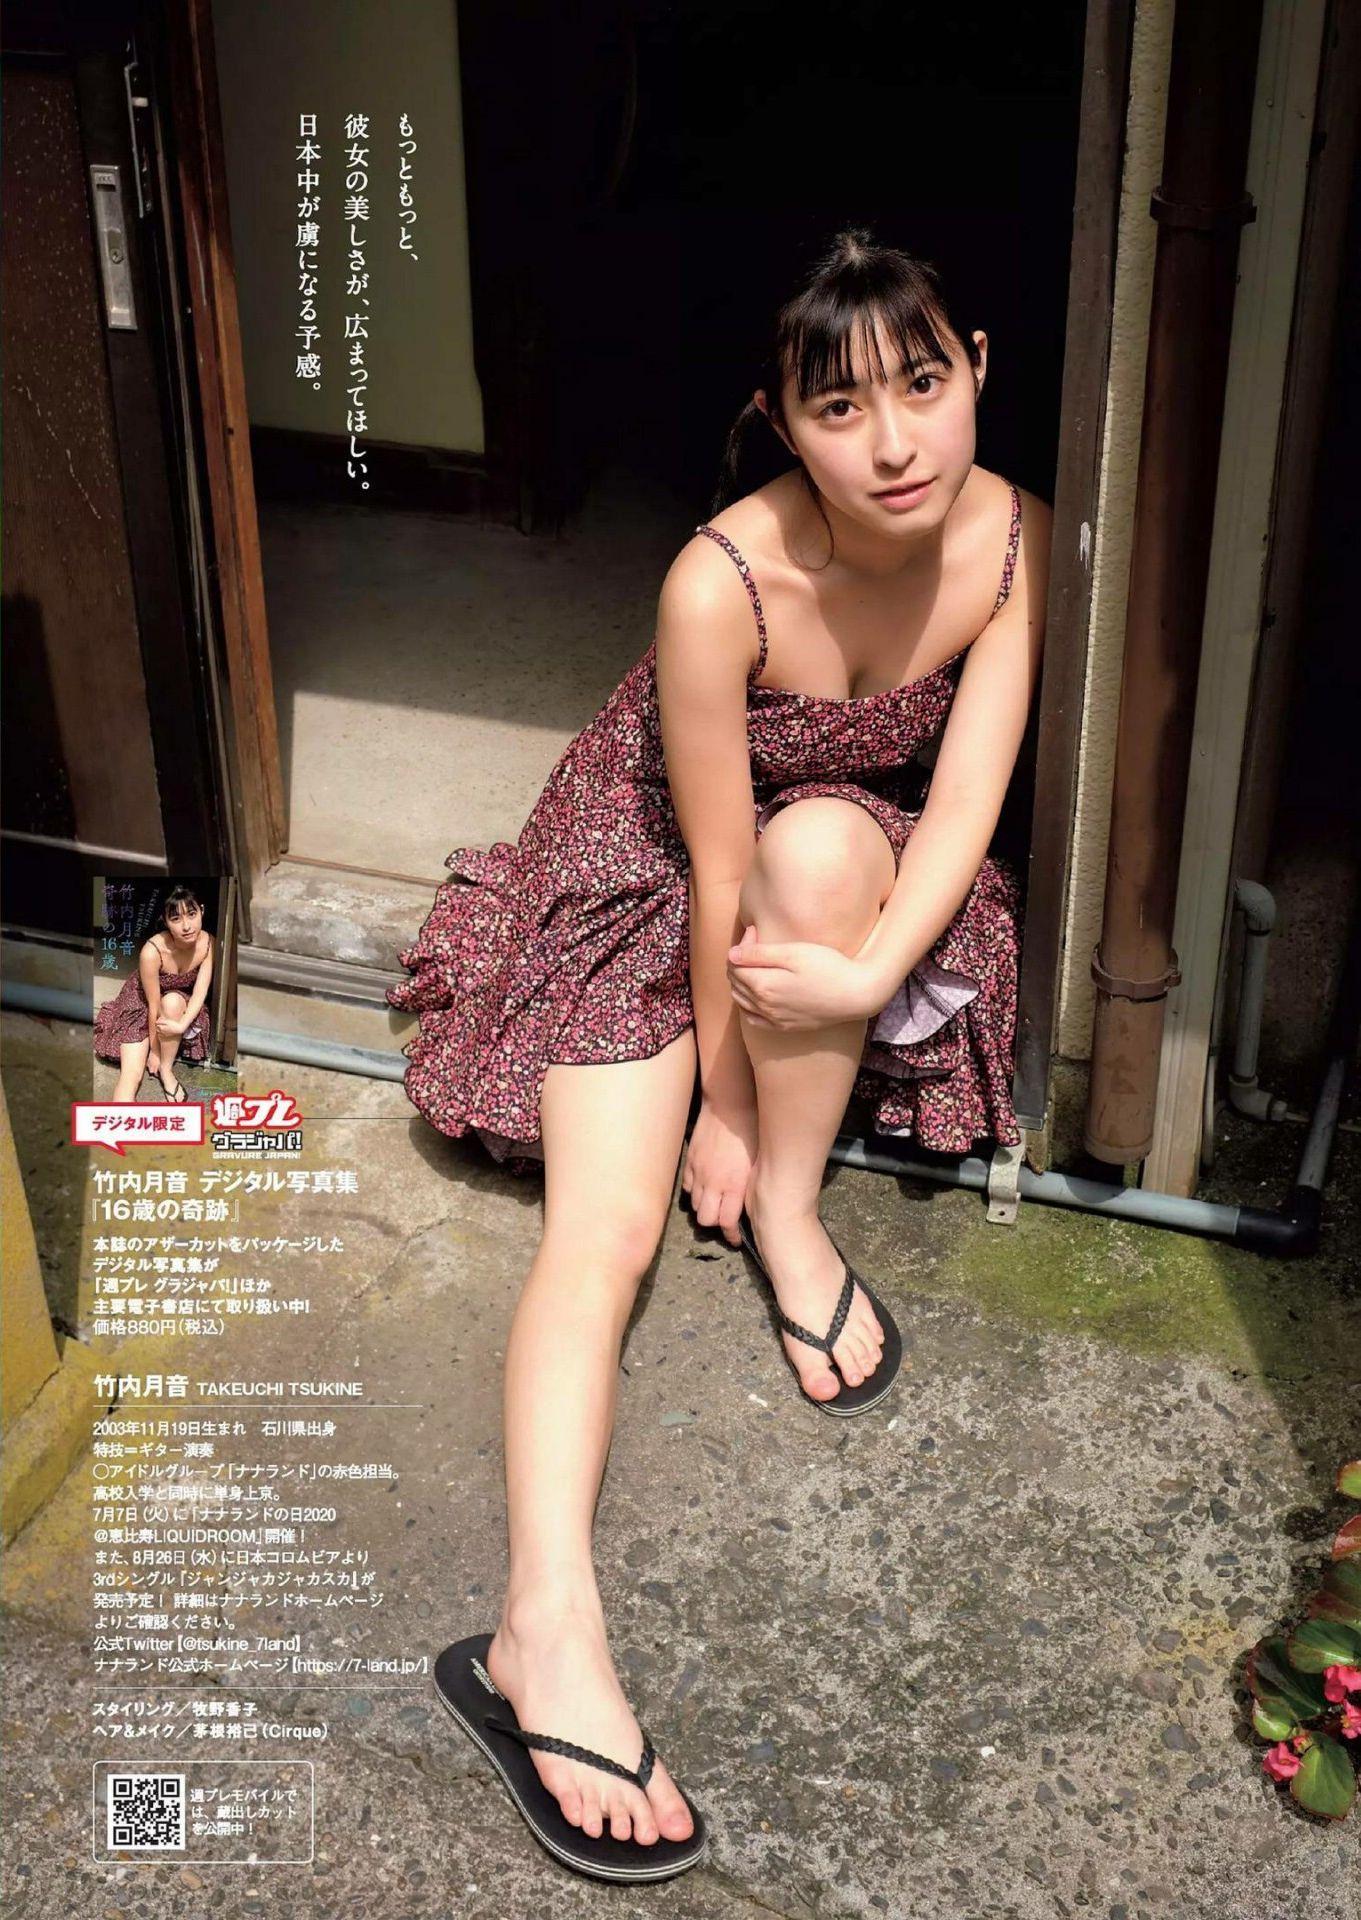 Weekly Playboy No.16